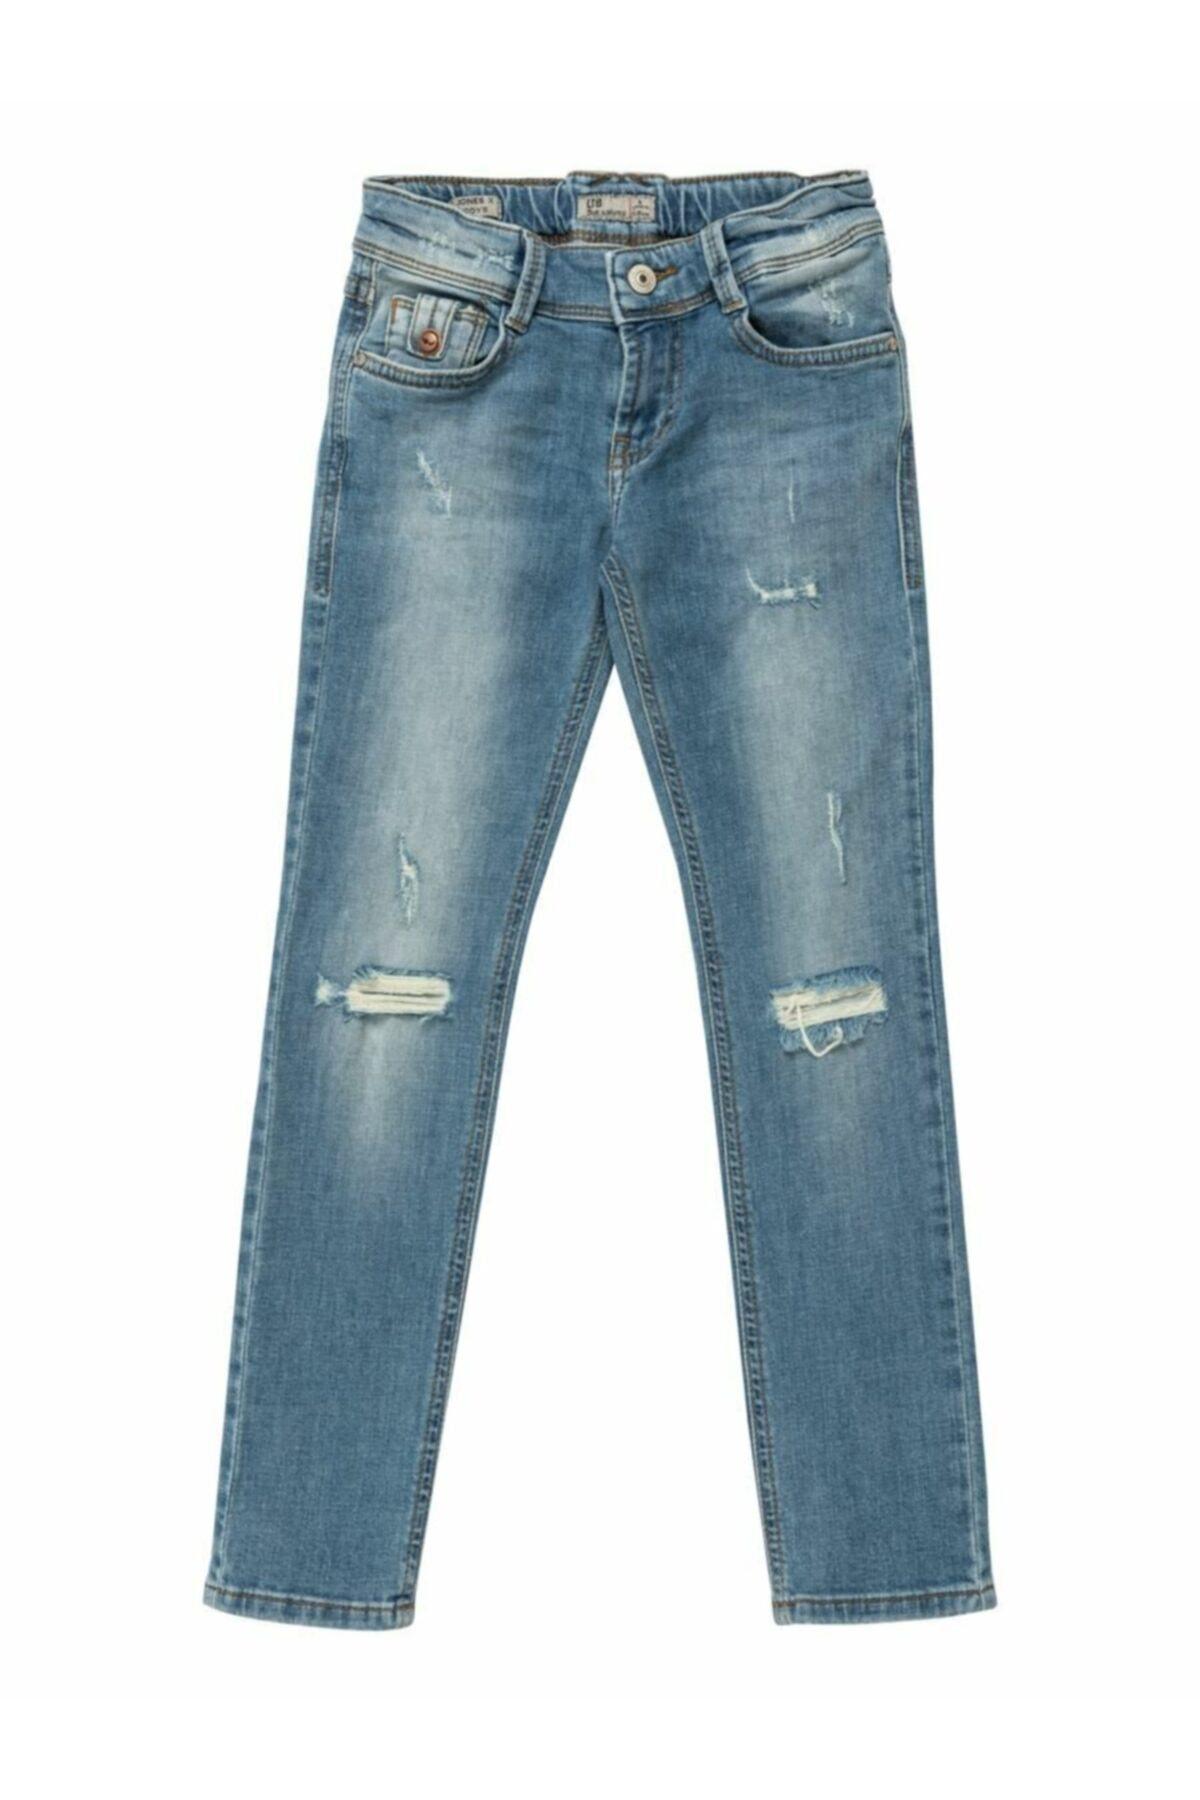 Ltb Jones X B Zola Wash Pantolon 1